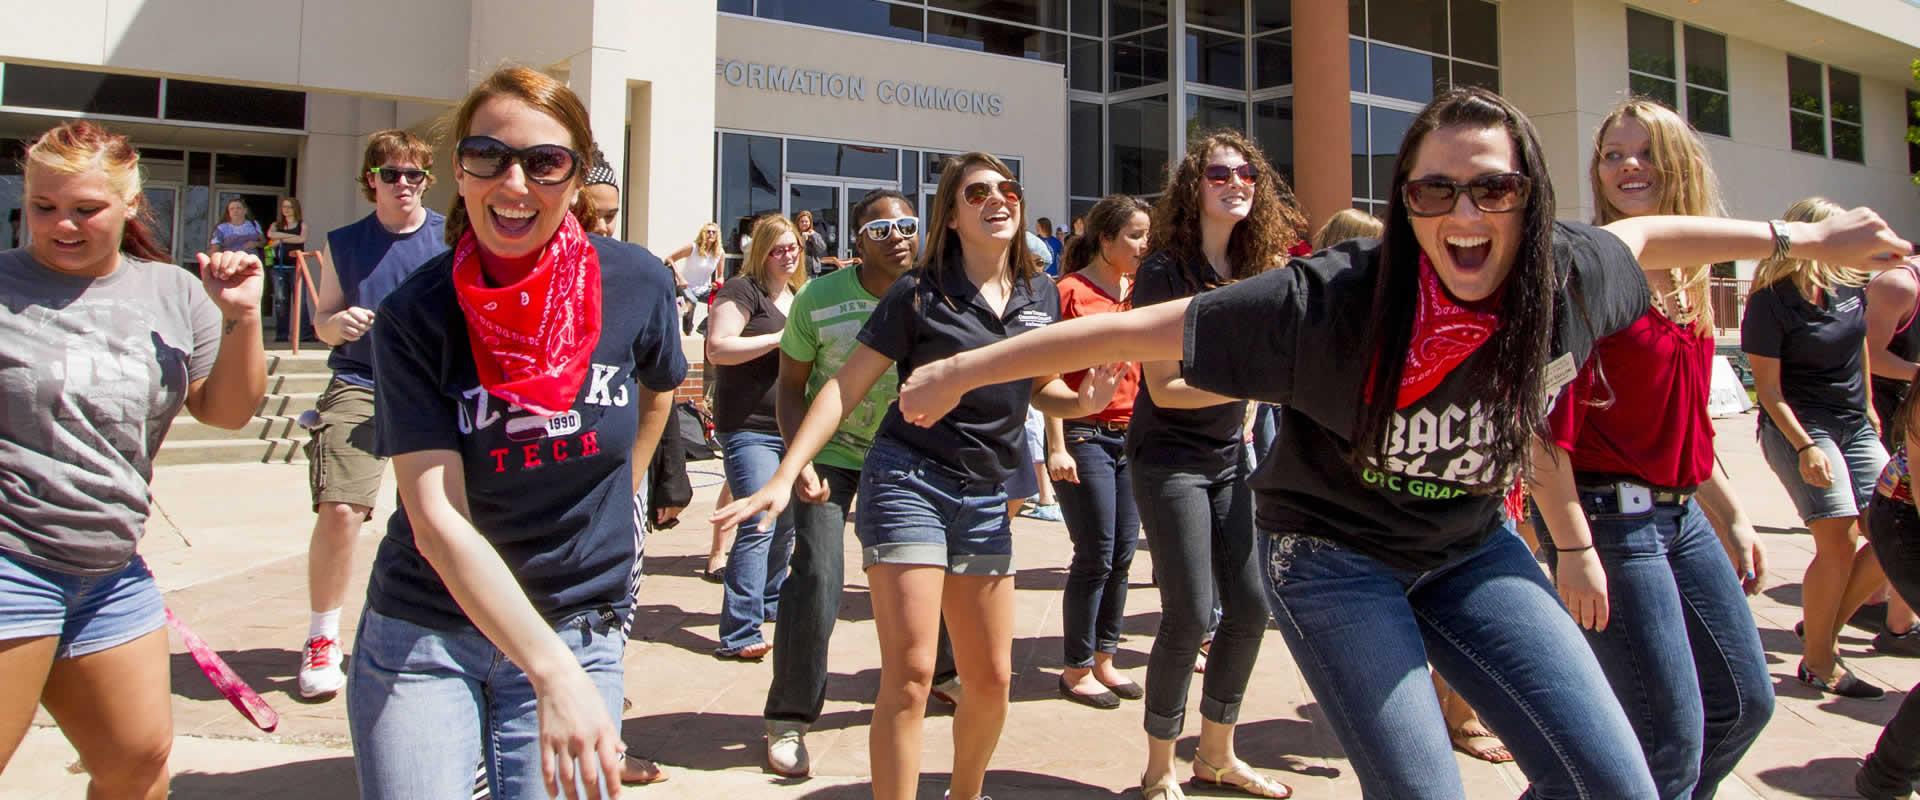 OTC Students-otc-students-academics-myotc-college-start-here-go-anywhere